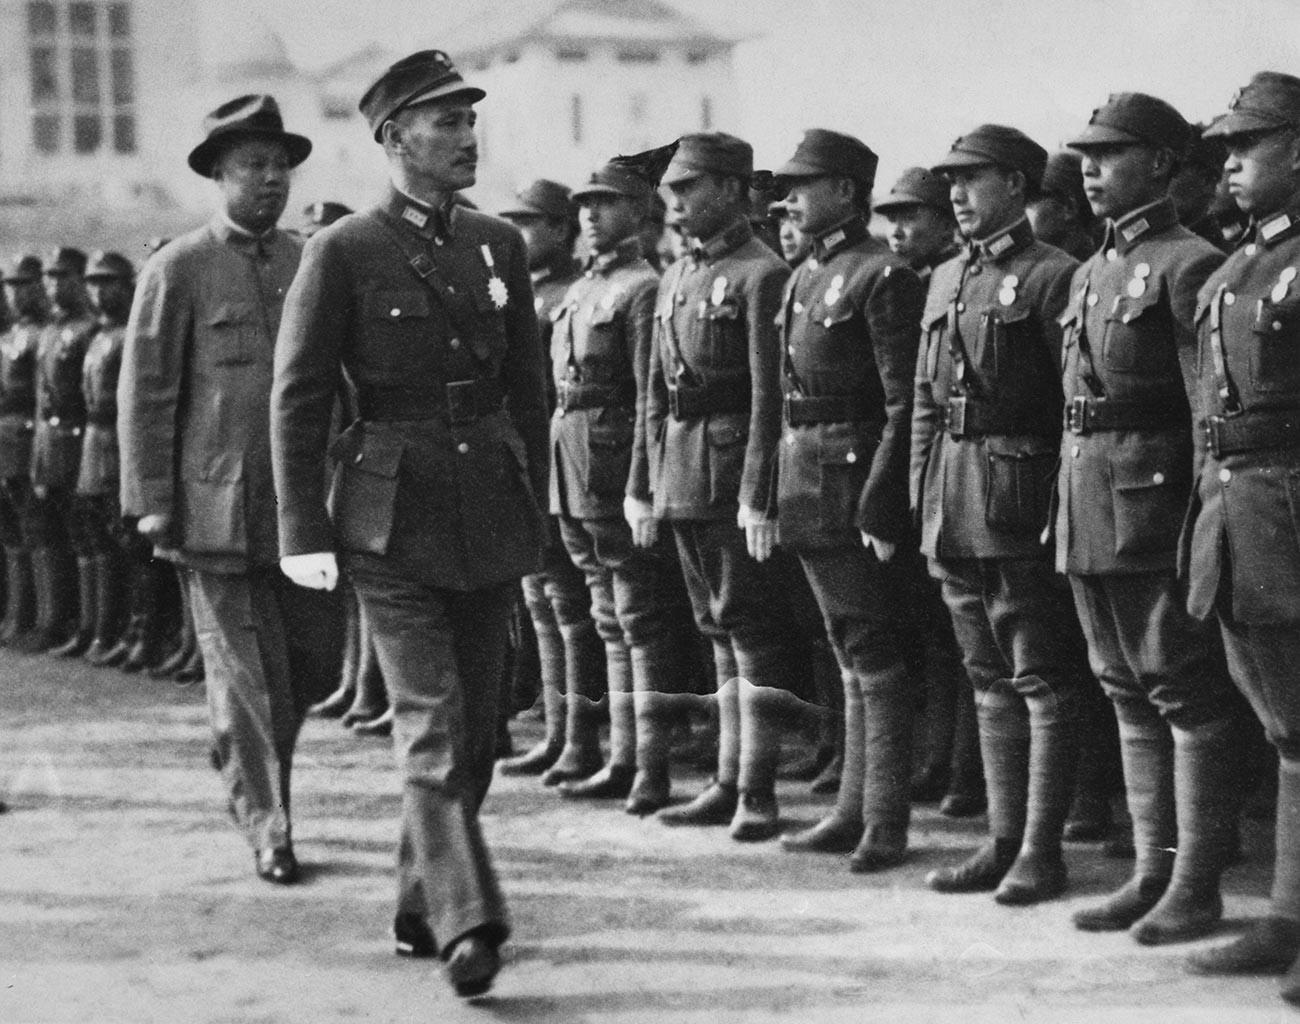 Pemimpin Tiongkok Chiang Kai-shek, 1950.